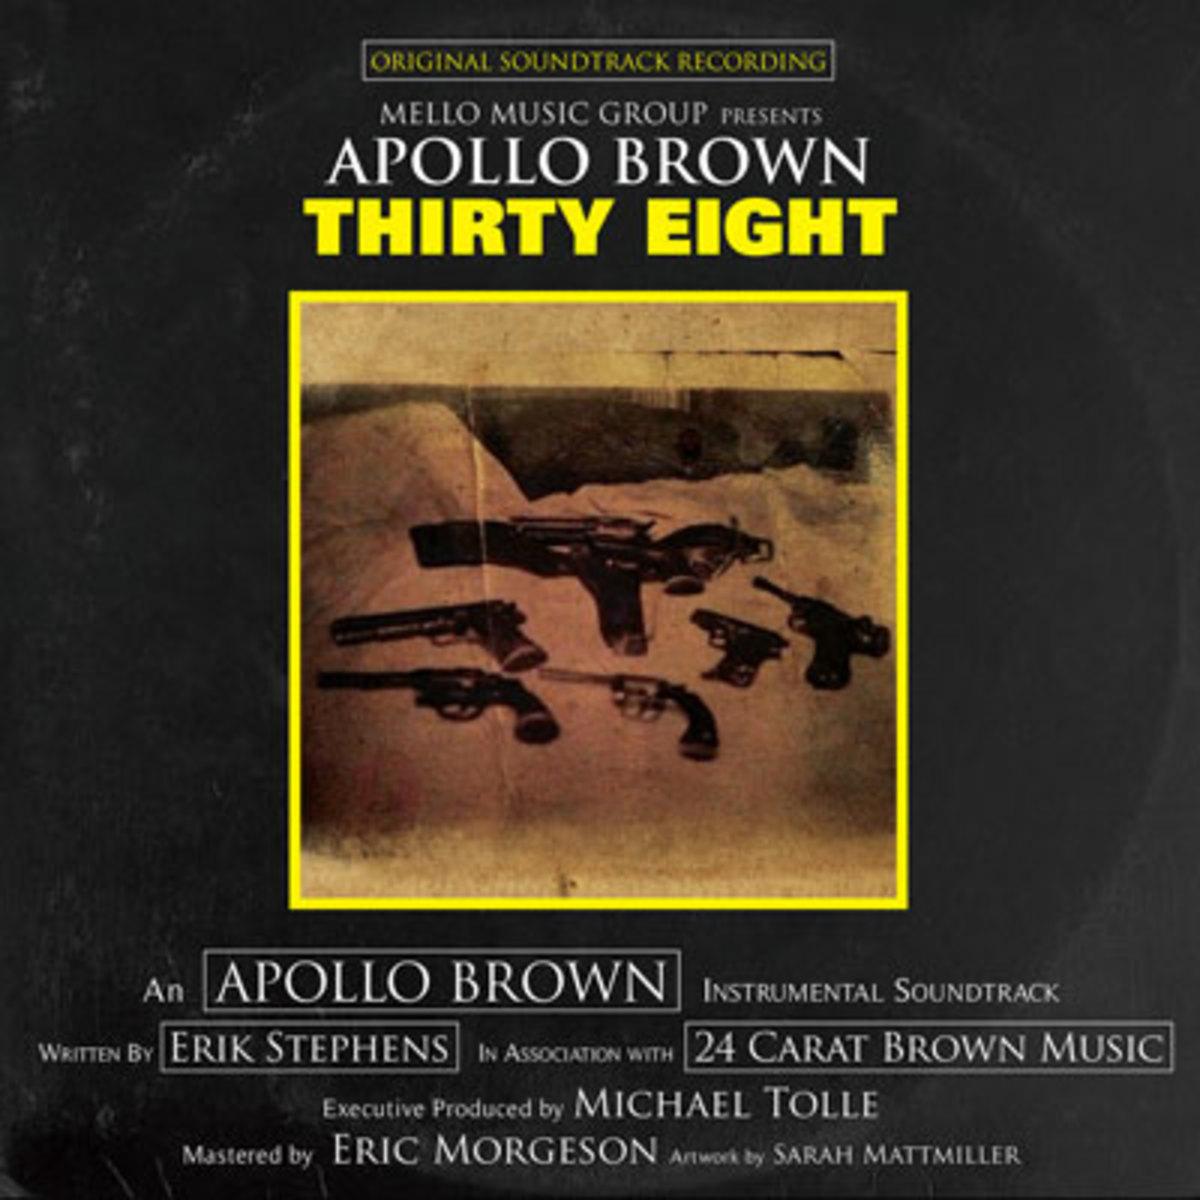 apollobrown-38.jpg